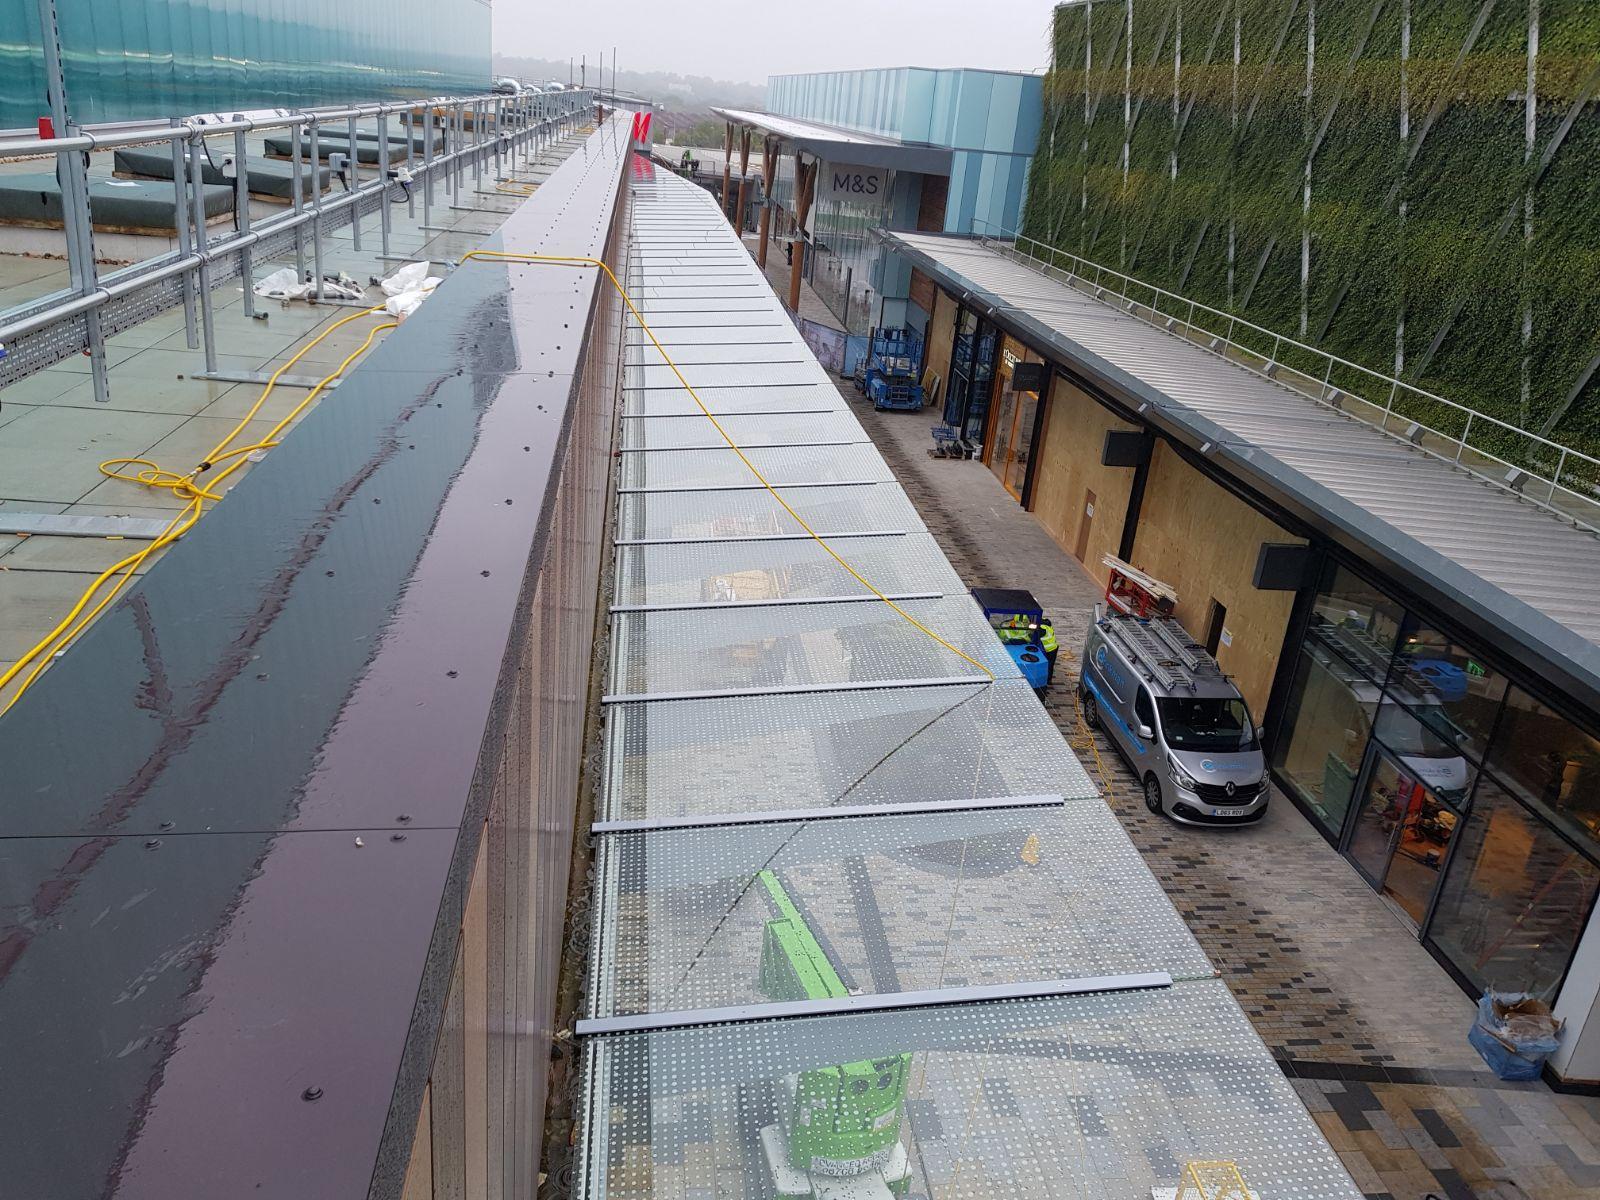 Lexicon - Rooftop